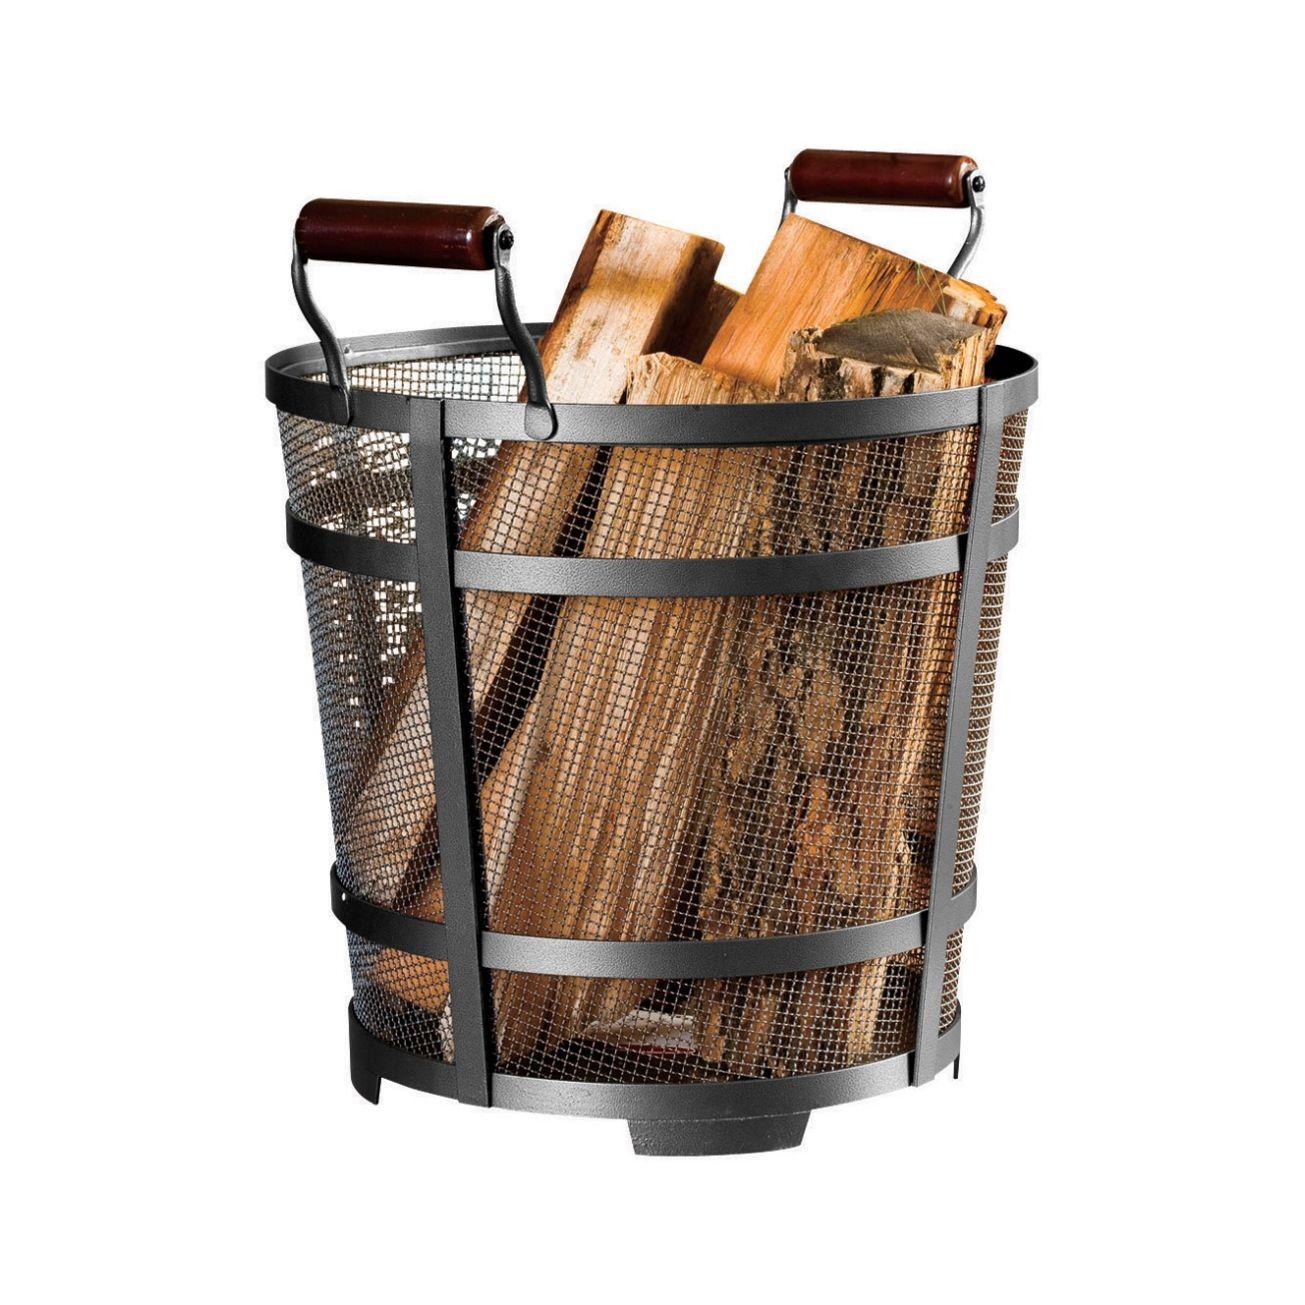 panacea modern prairie log bin ()  log racks  holders  ace  - panacea modern prairie log bin ()  log racks  holders  ace hardware